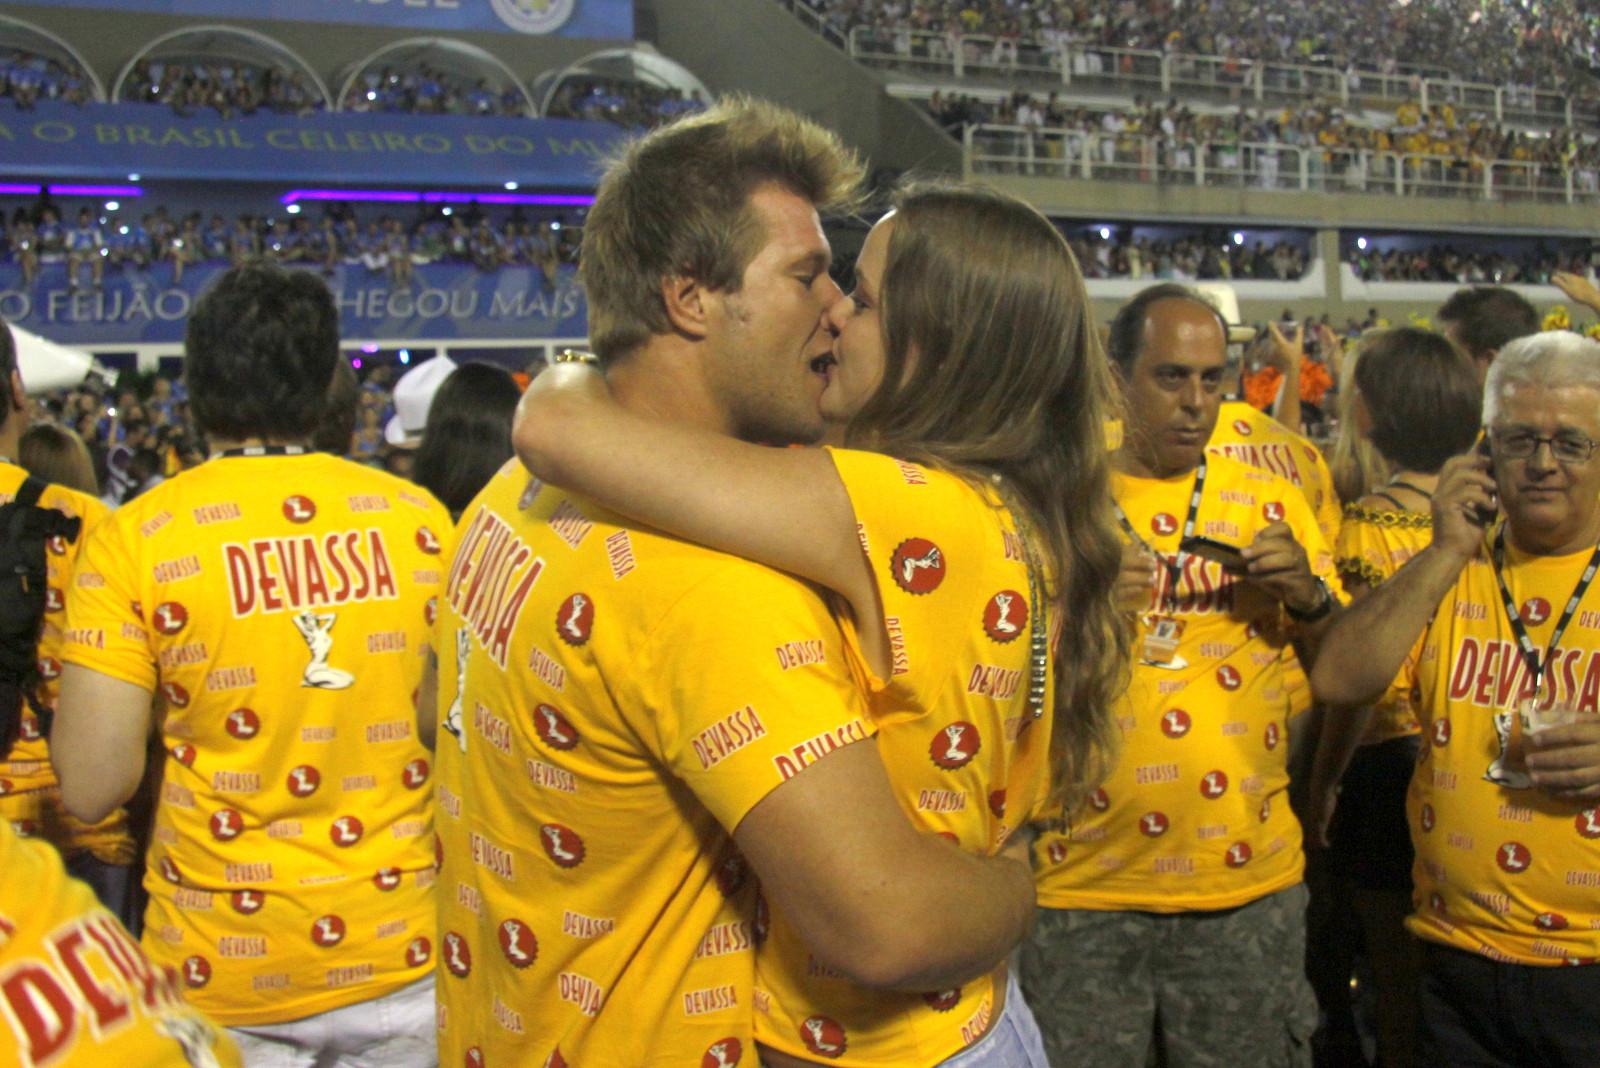 Diego Alemão beija a namorada, Vivian Steinhoff